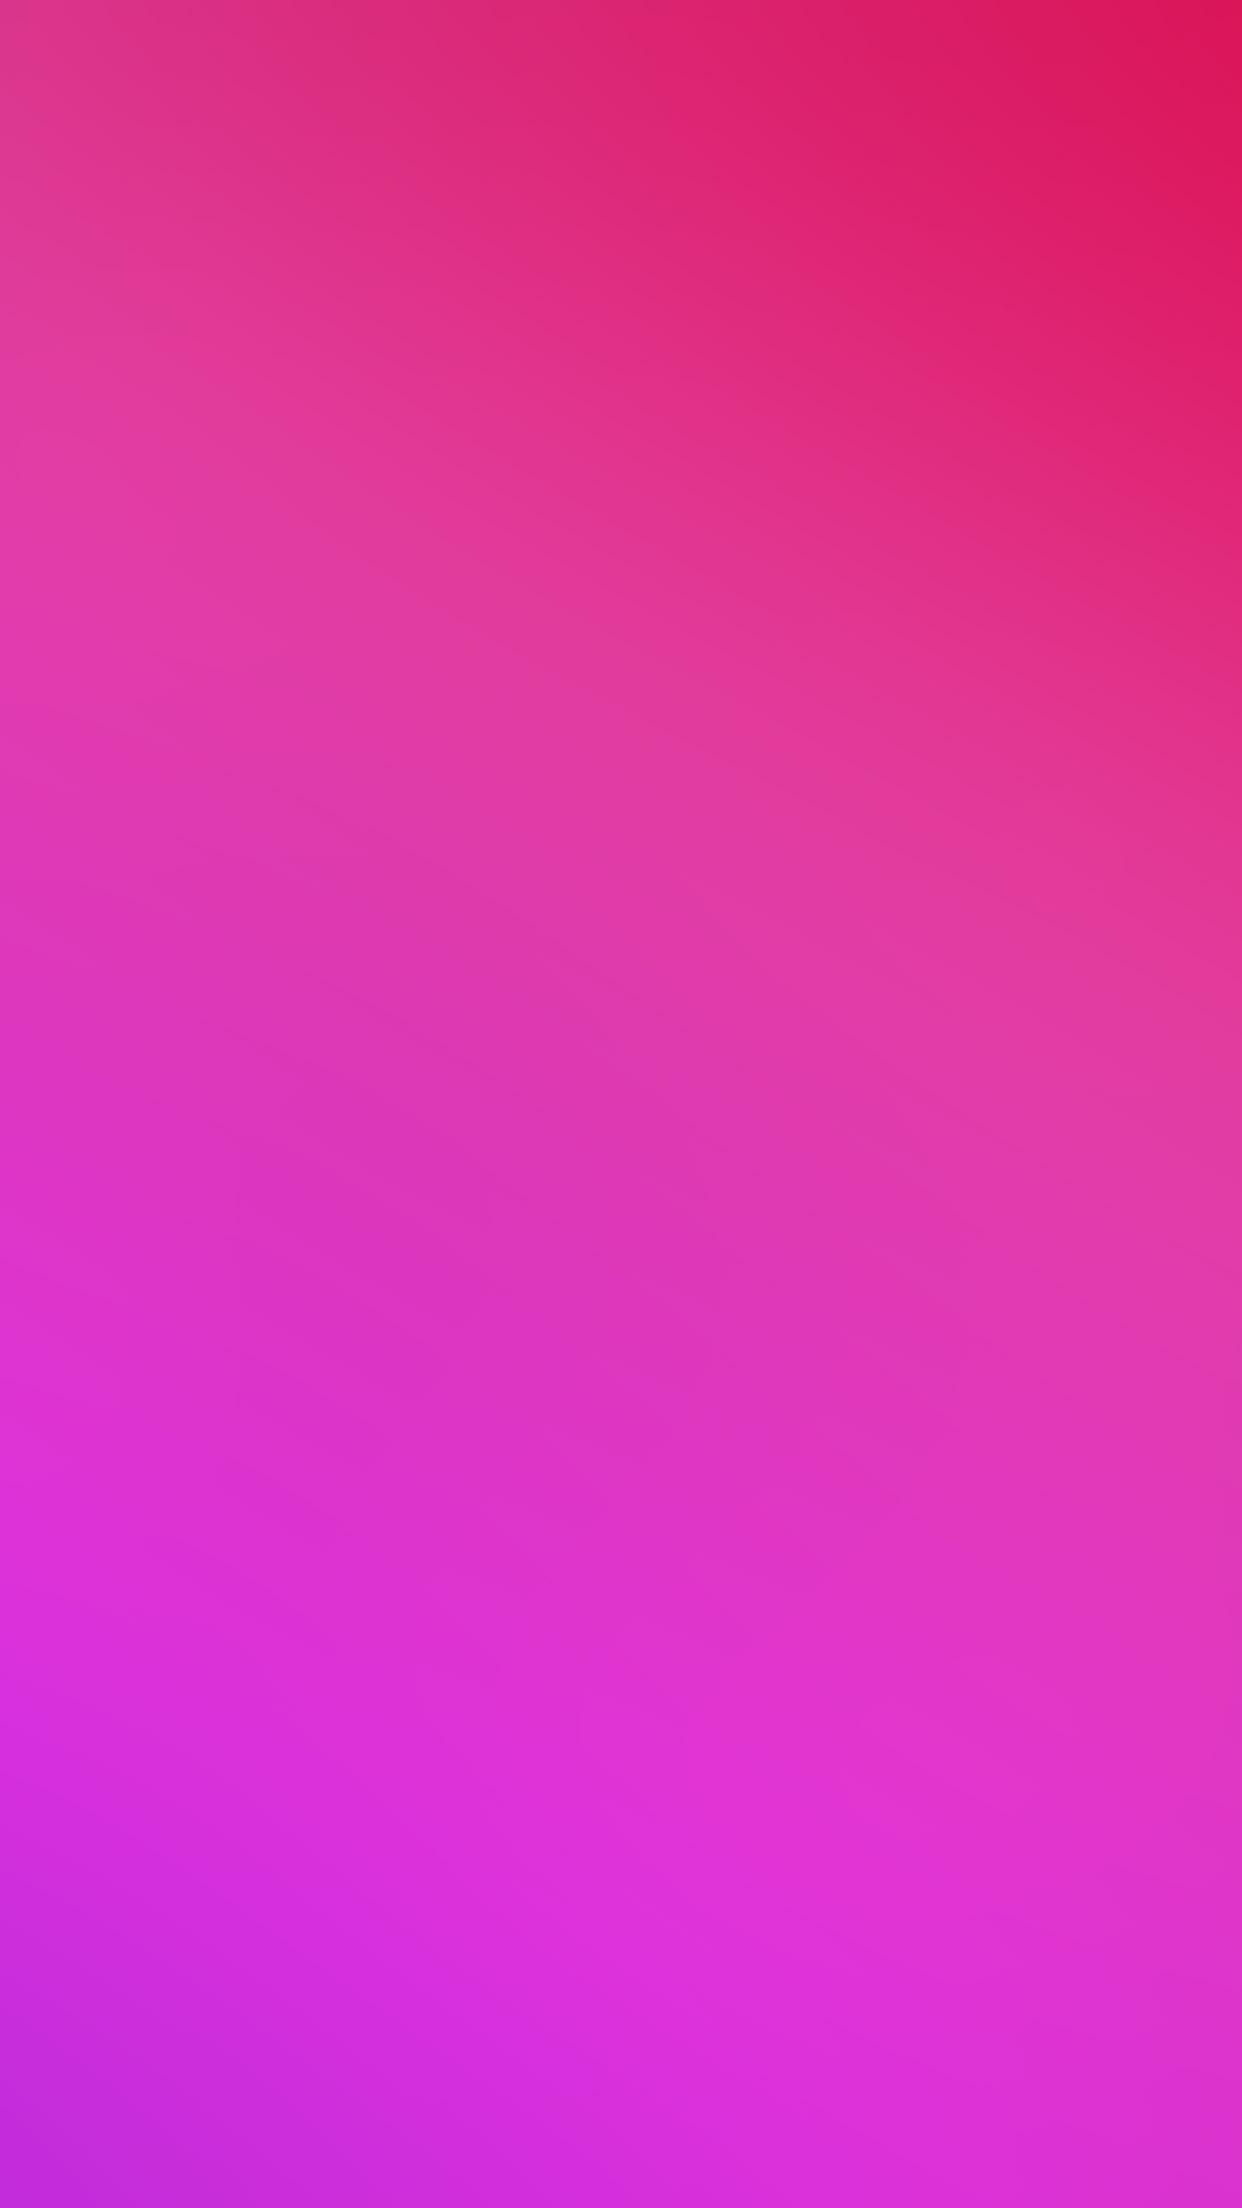 Sg39 Pink Purple Combination Inside Gradation Blur